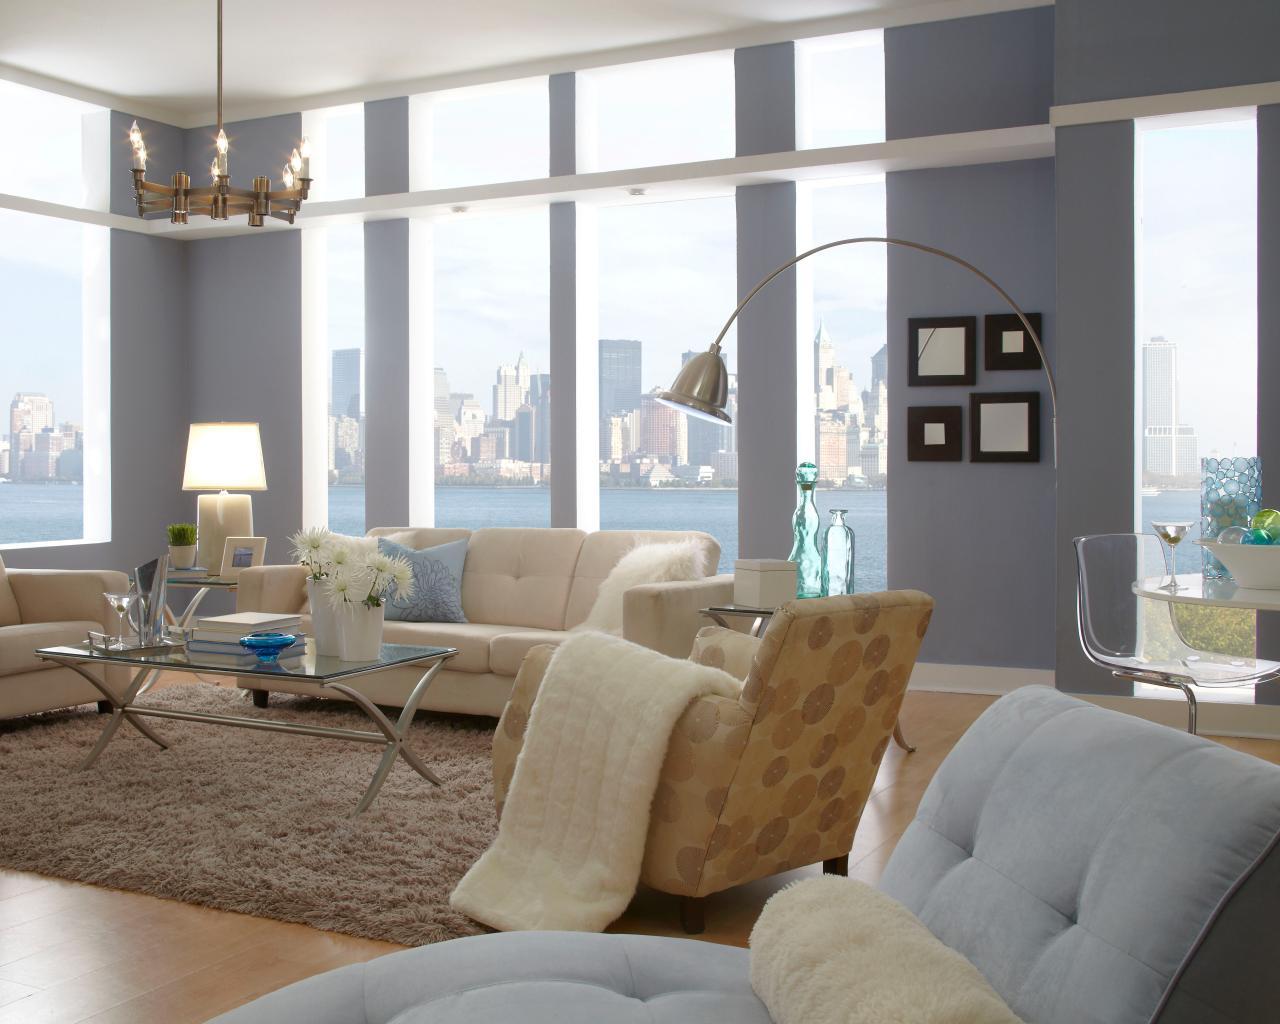 original-midcentury-modern-living-room-portrait_s4x3-jpg-rend-hgtvcom-1280-1024